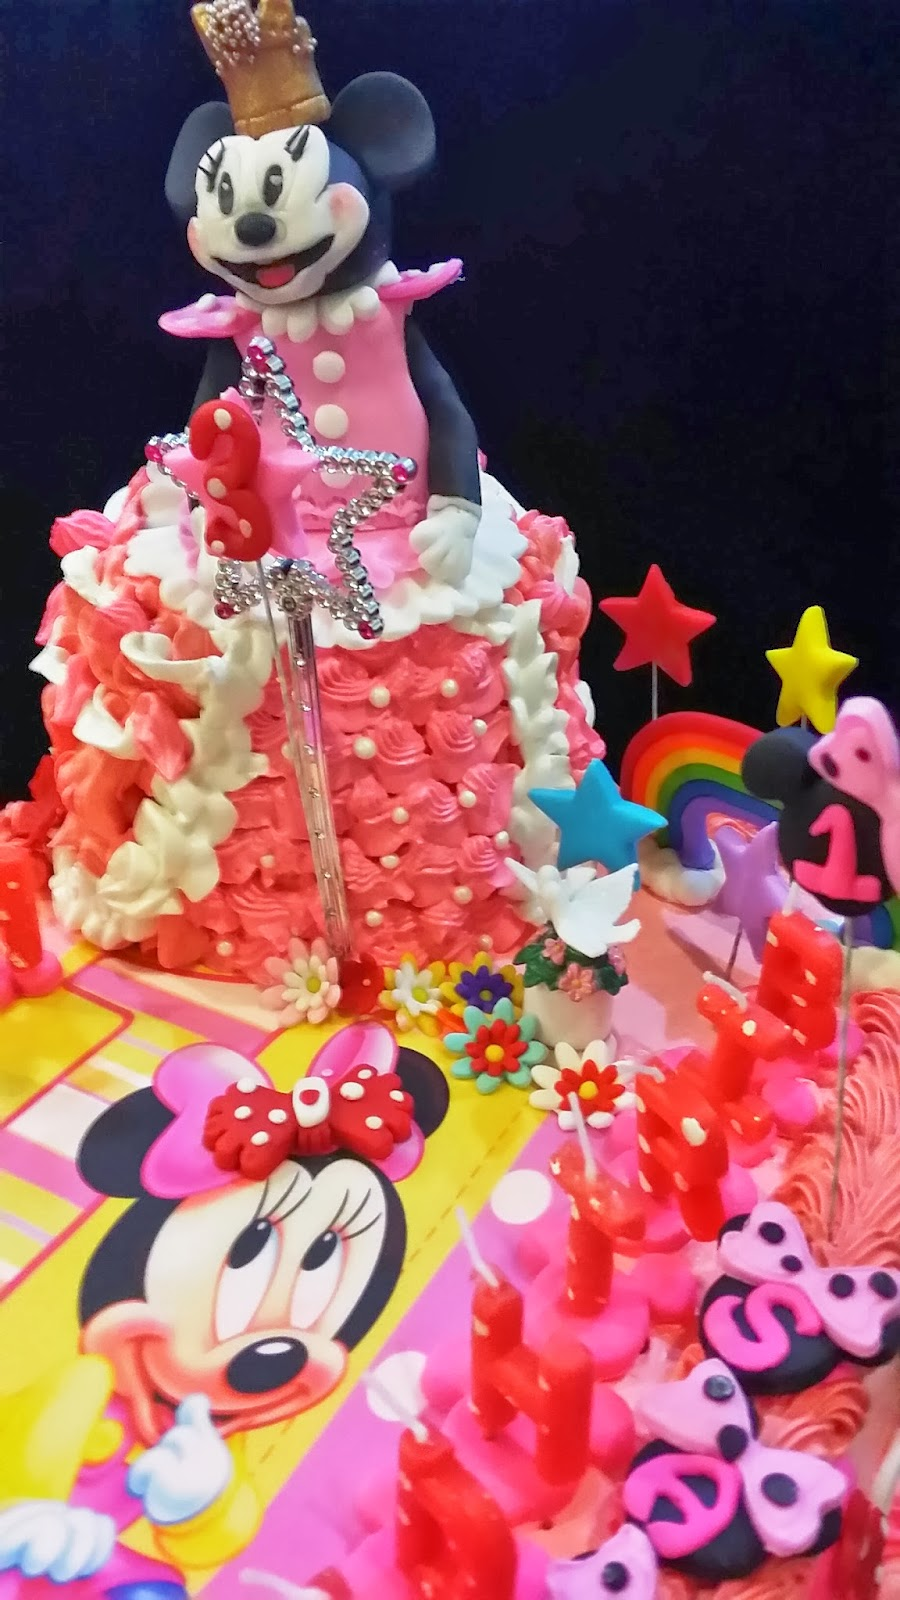 Sweet creations princess minnie mouse baby minnie edible chocolate blueberry cake and vanilla - Princesse minnie ...